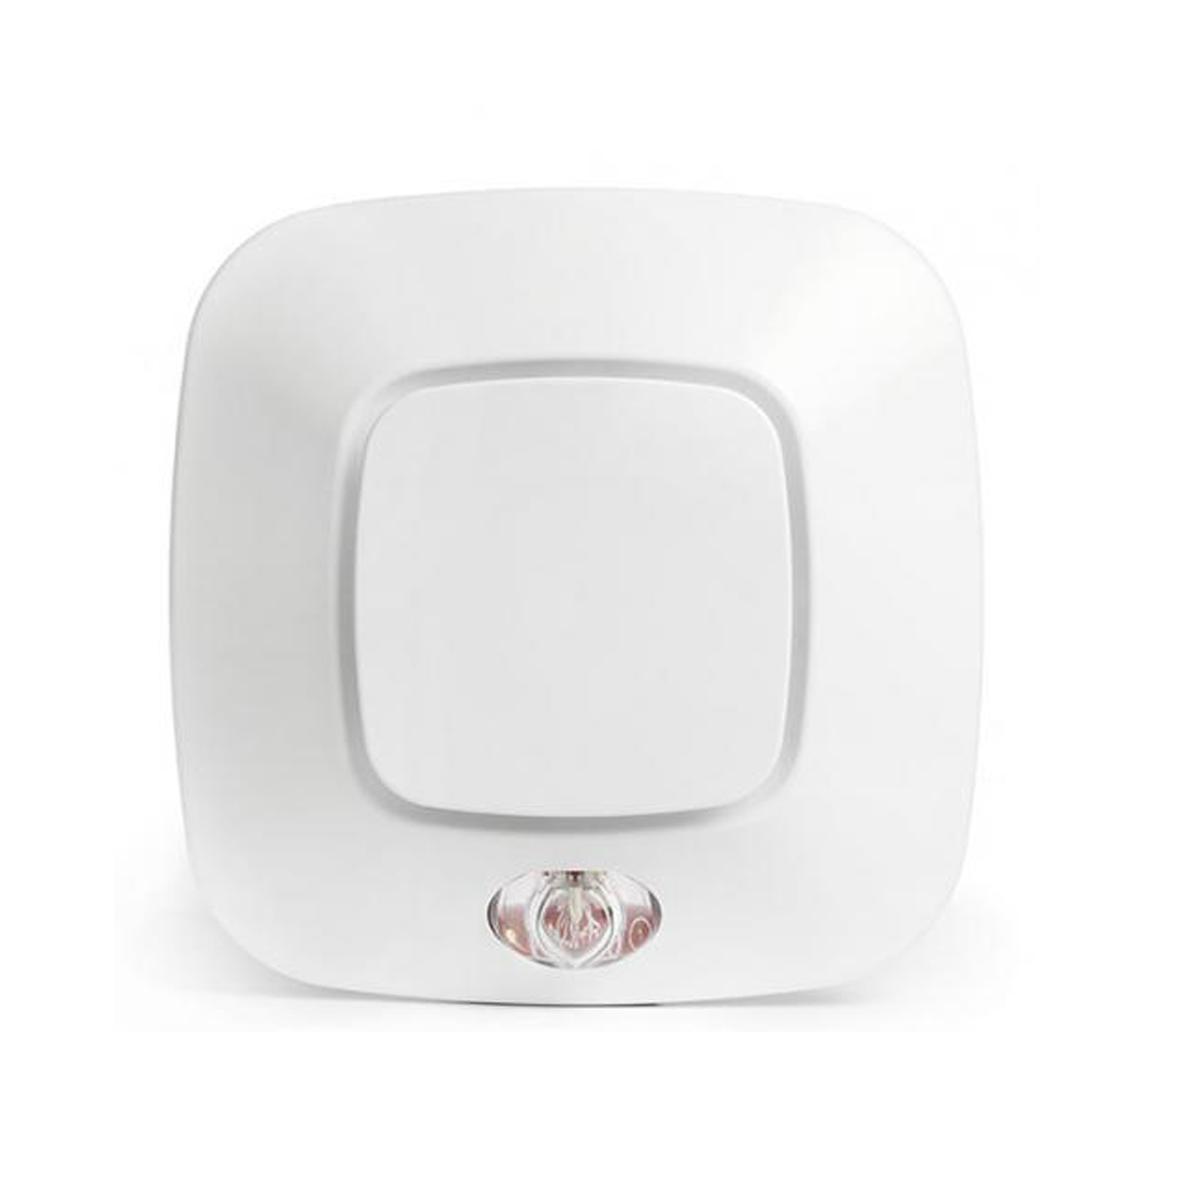 Sirene Exterior c/ Flash e Voz IP65